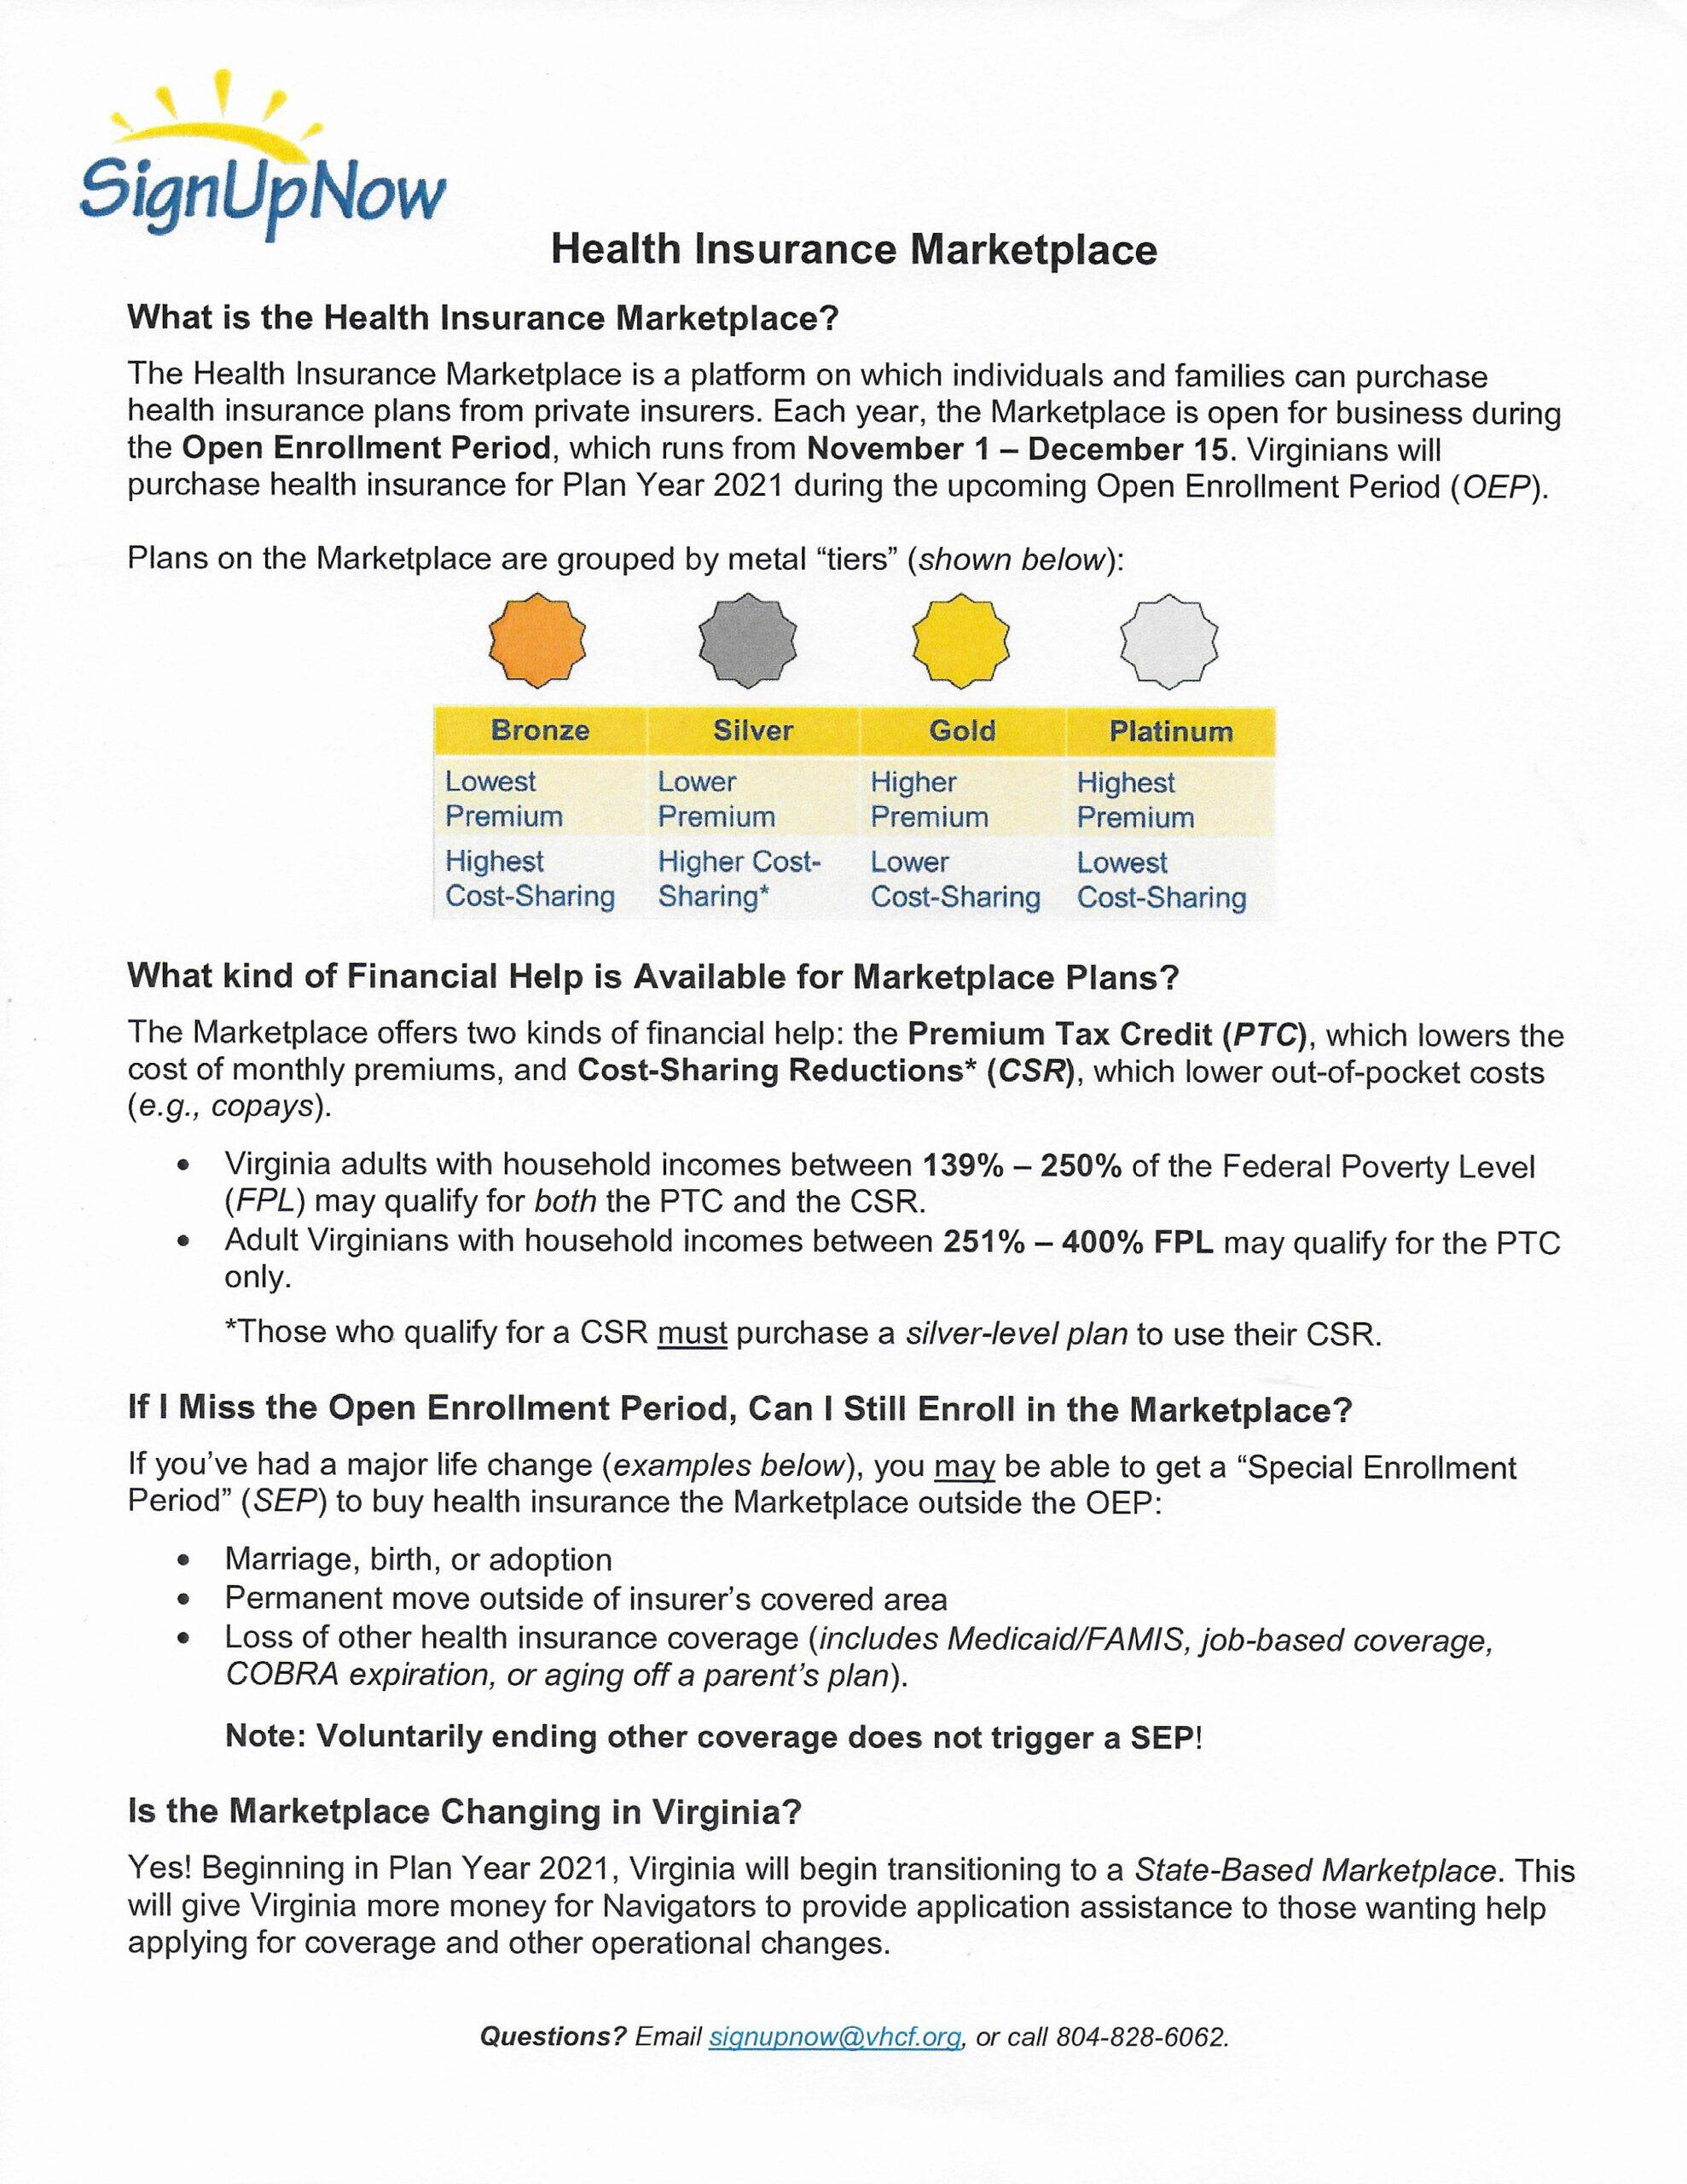 Health_Insurance_Marketplace